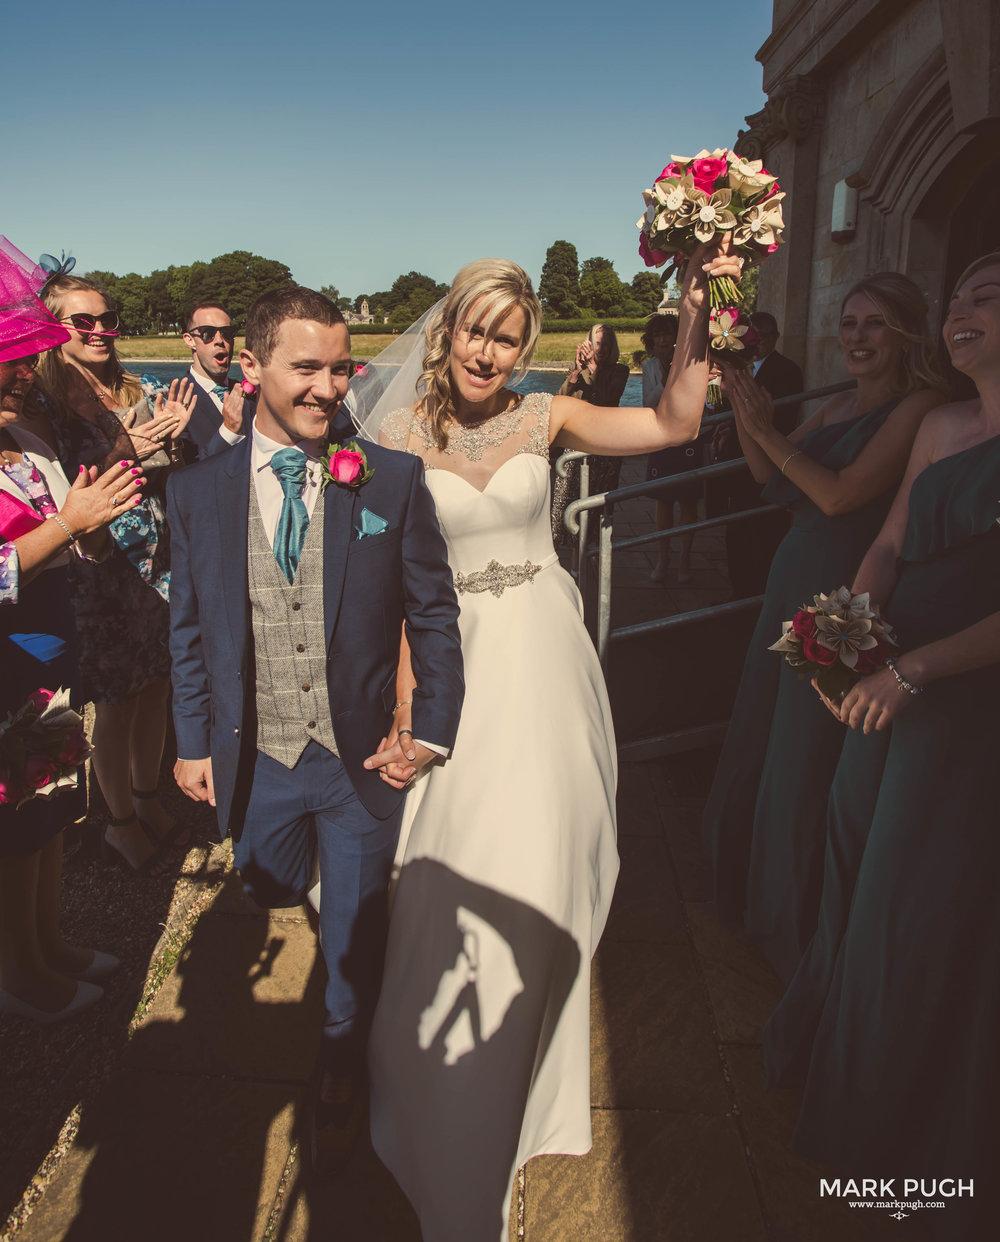 057 - Fliss and Jamie- fineART wedding photography at Rutland Water UK by www.markpugh.com Mark Pugh of www.mpmedia.co.uk_.JPG